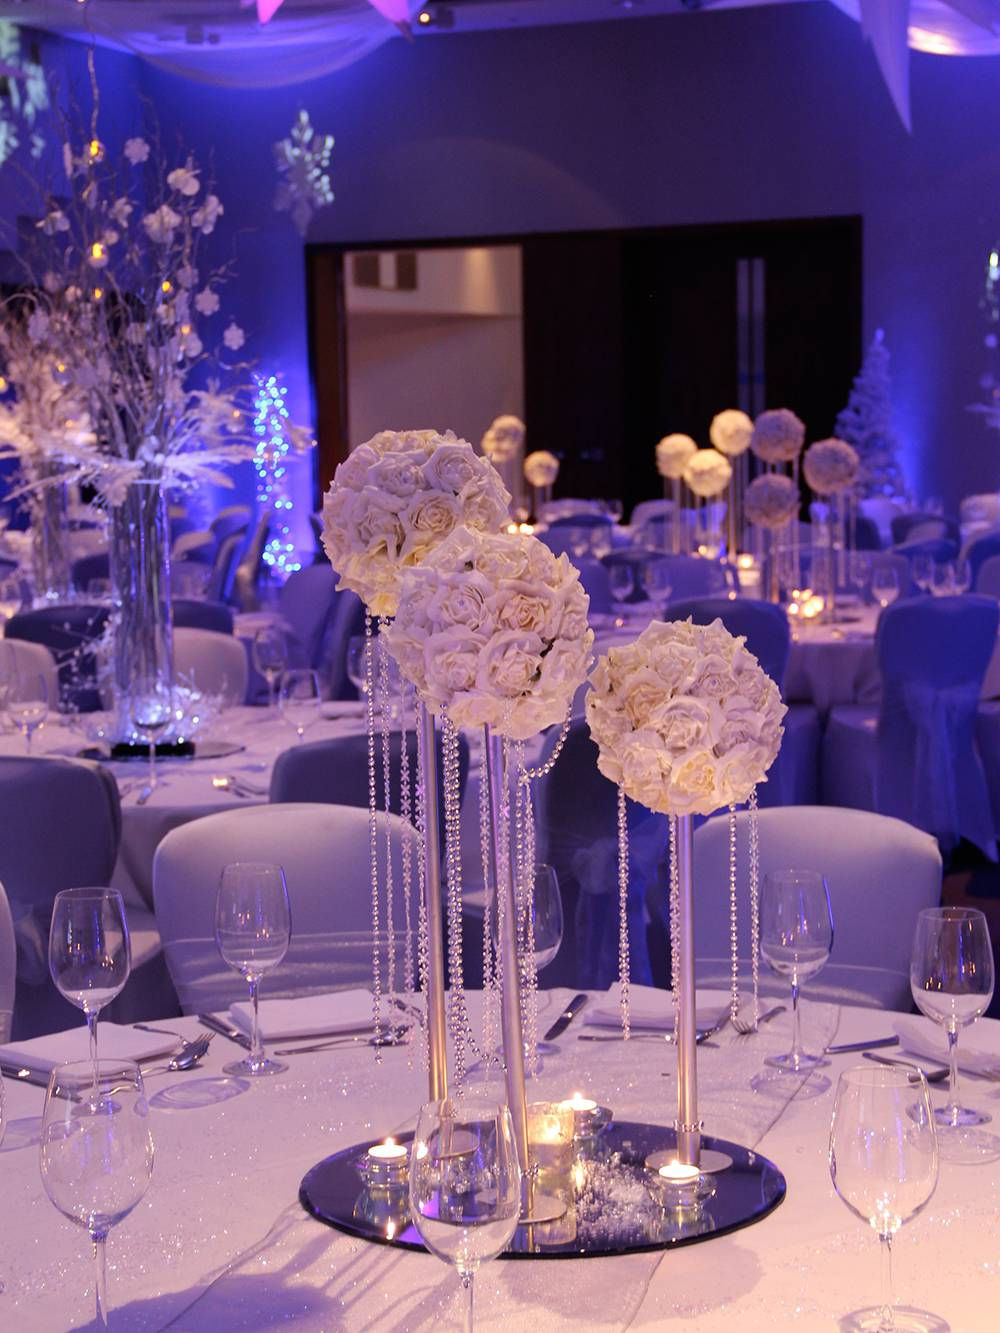 Winter wonderland theme venue dressing at Hilton Hotel Liverpool